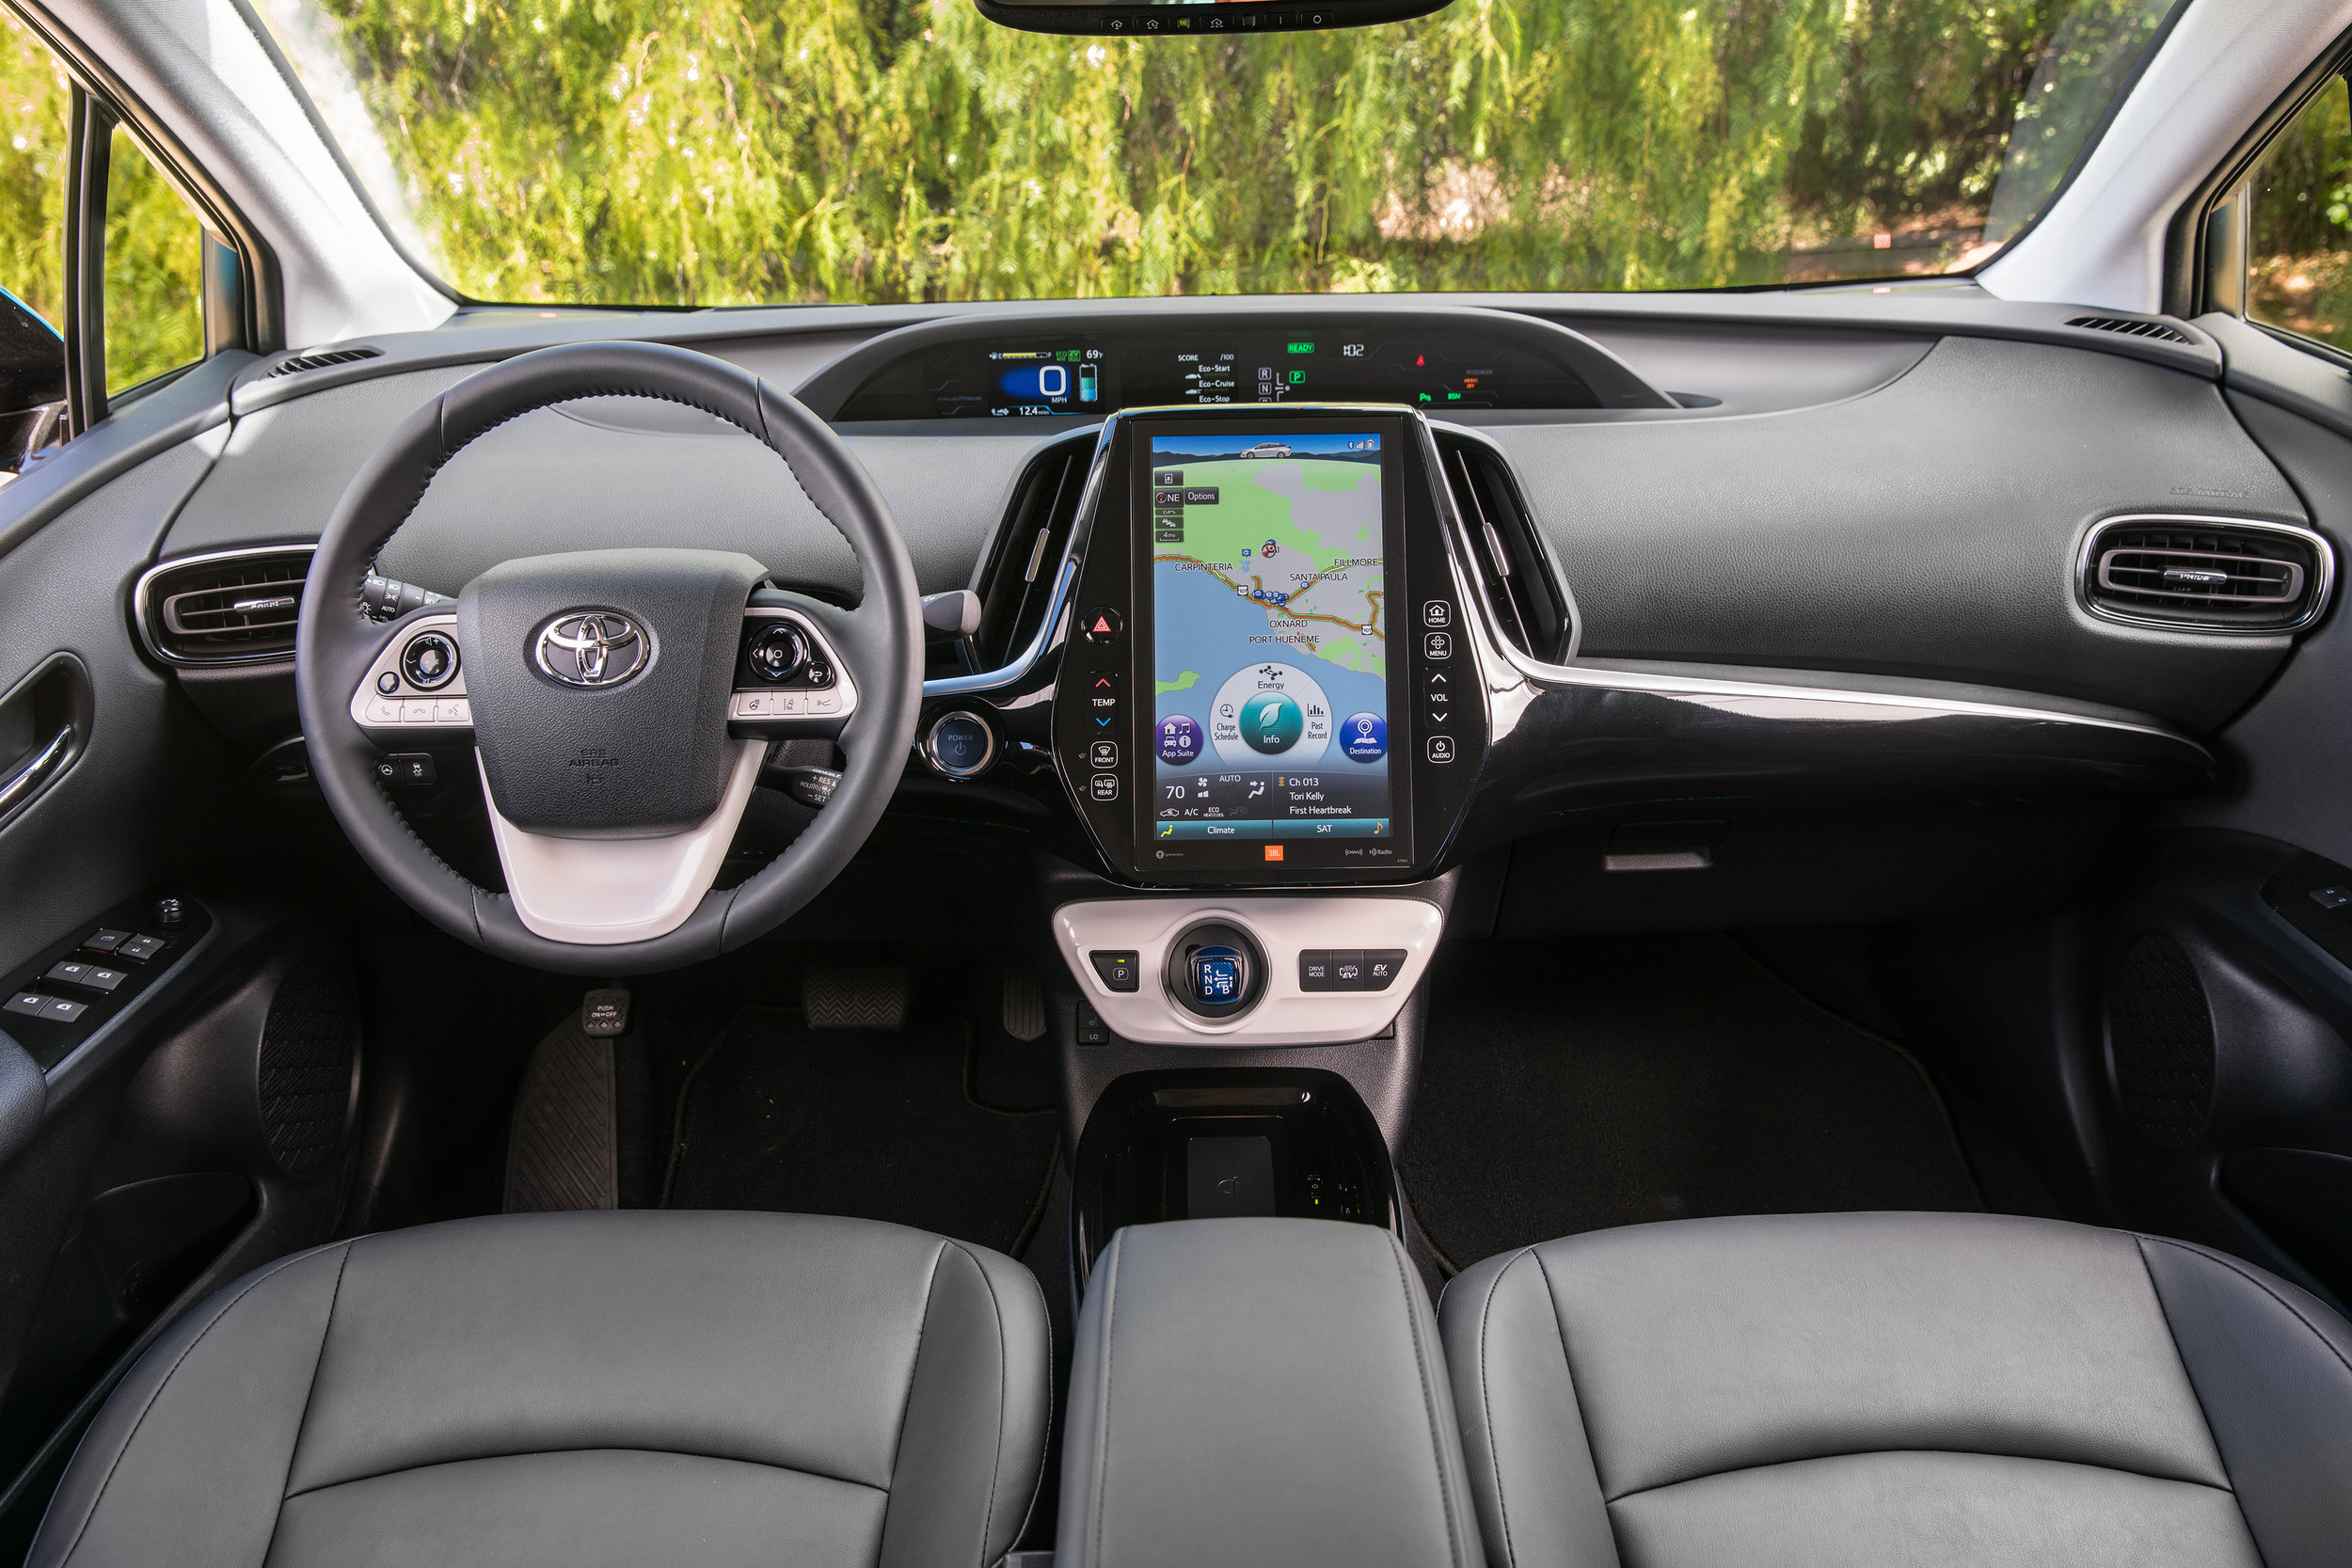 2017_Toyota_Prius_Prime_Advanced_015_C283CEAA02965758031AAFDC1596534A77E5B57D.jpg